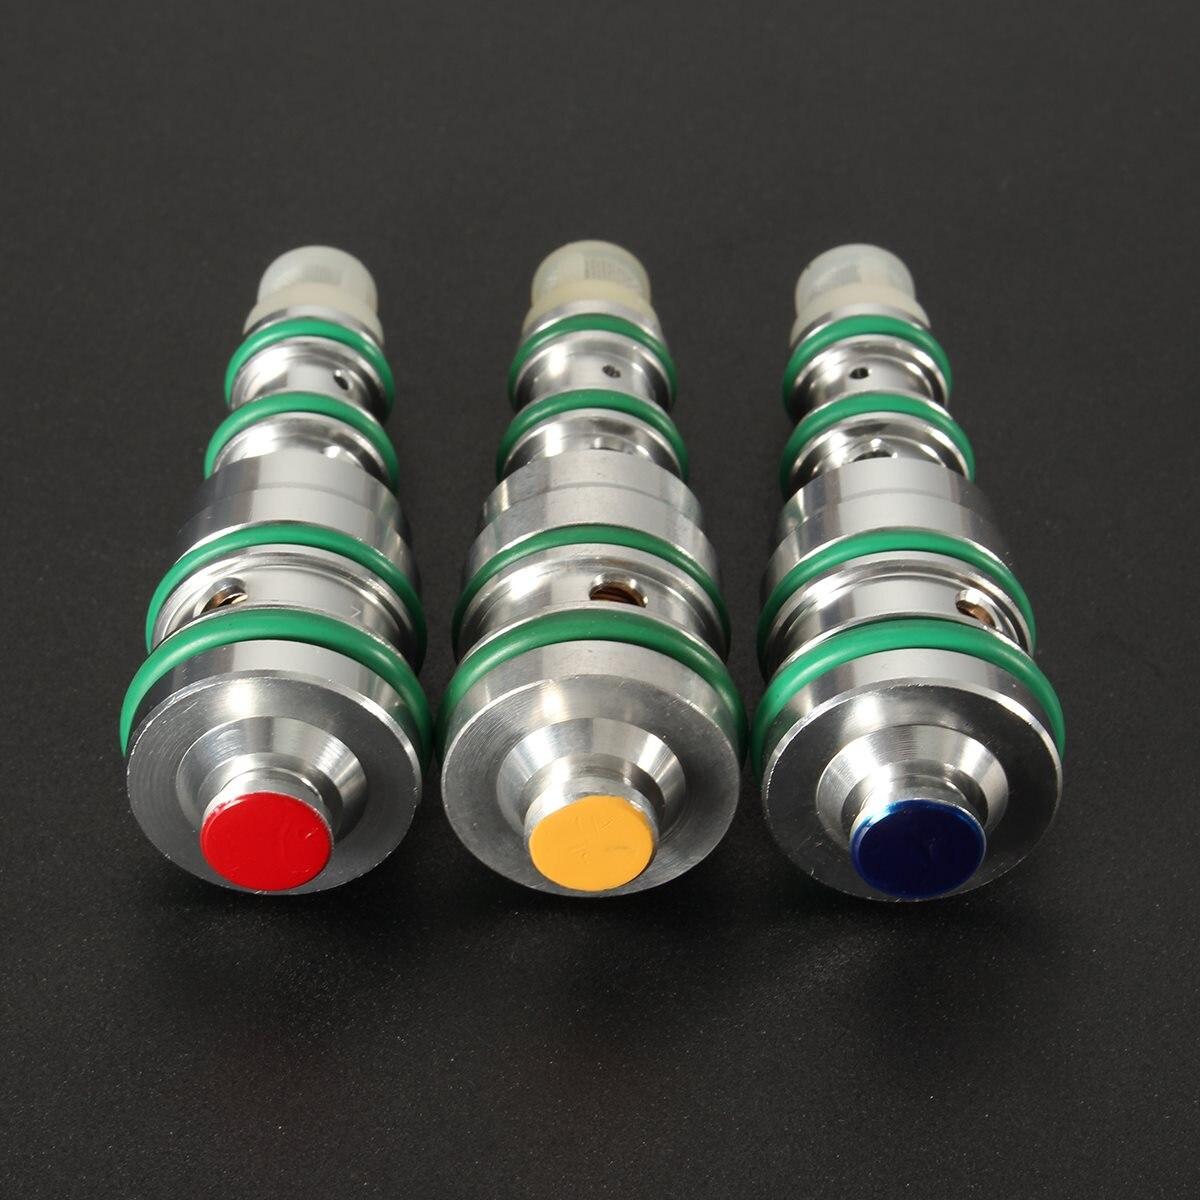 44Psi 42Psi 40Psi Electromagnetic Valve Control Valve For Buick /Volkswagen /Opel /DAEWOO /Peugeot V5 Compressor R12 or R134a